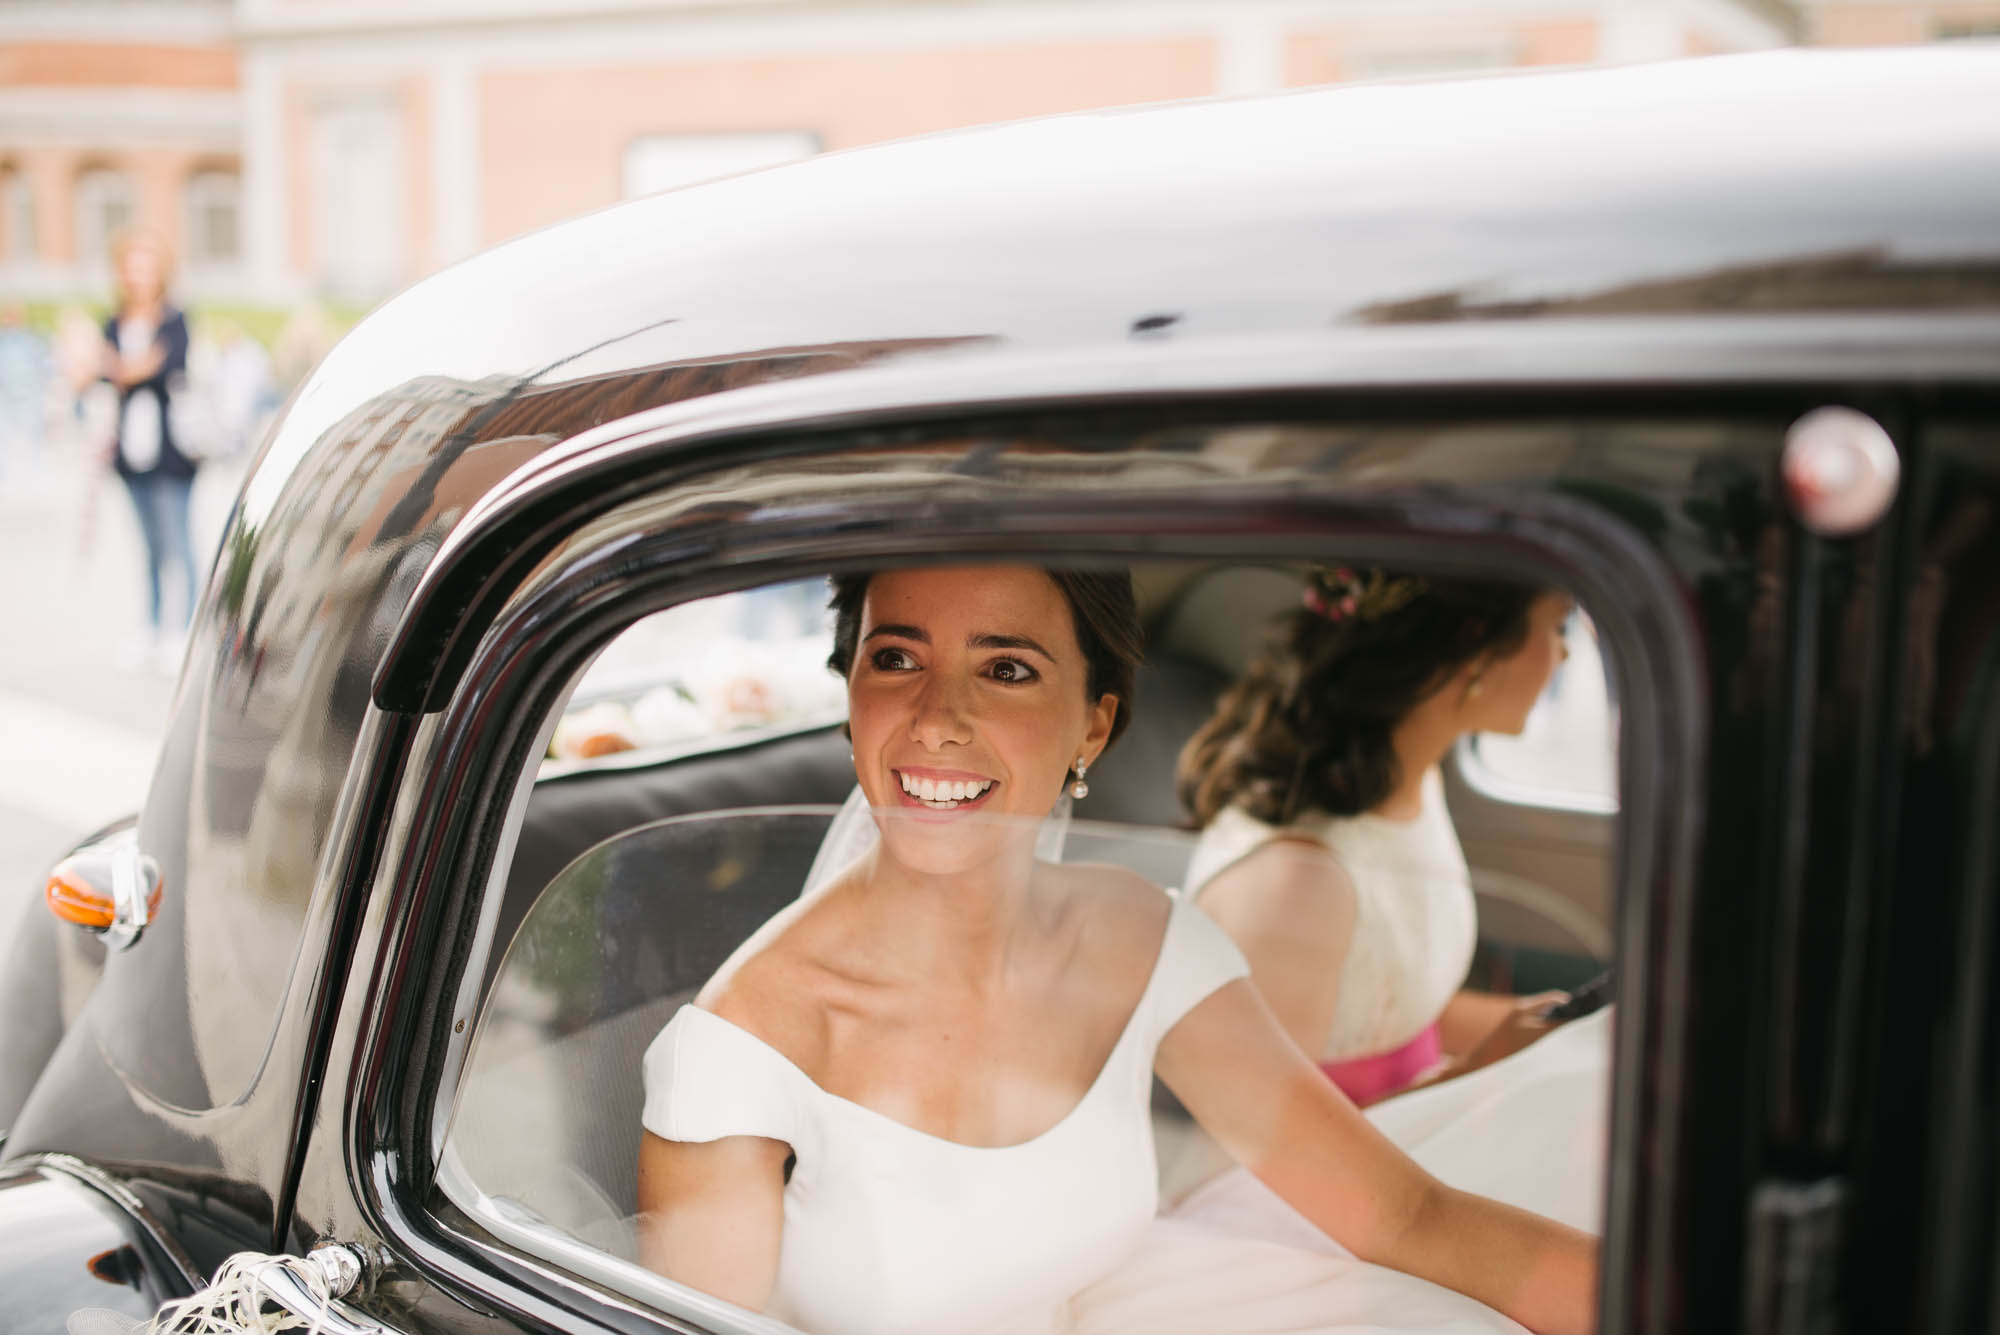 La novia llega en el coche a la catedral